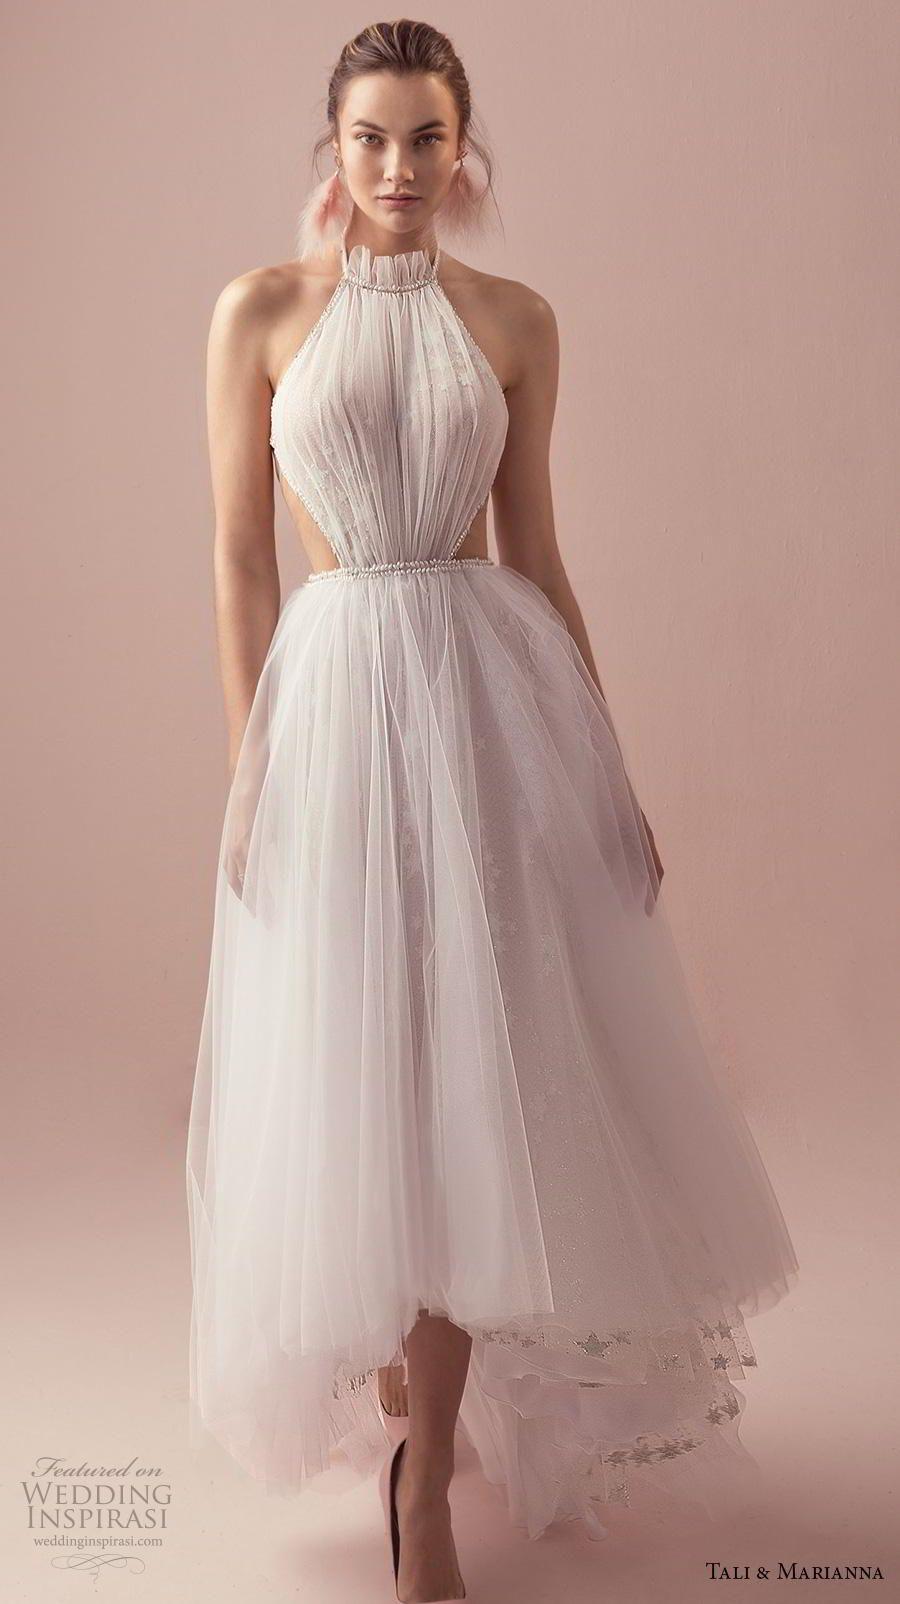 Tali Marianna 2018 Wedding Dresses The One Bridal Collection Wedding Inspirasi Short Wedding Dress Halter Wedding Dress Wedding Dresses High Low [ 1604 x 900 Pixel ]